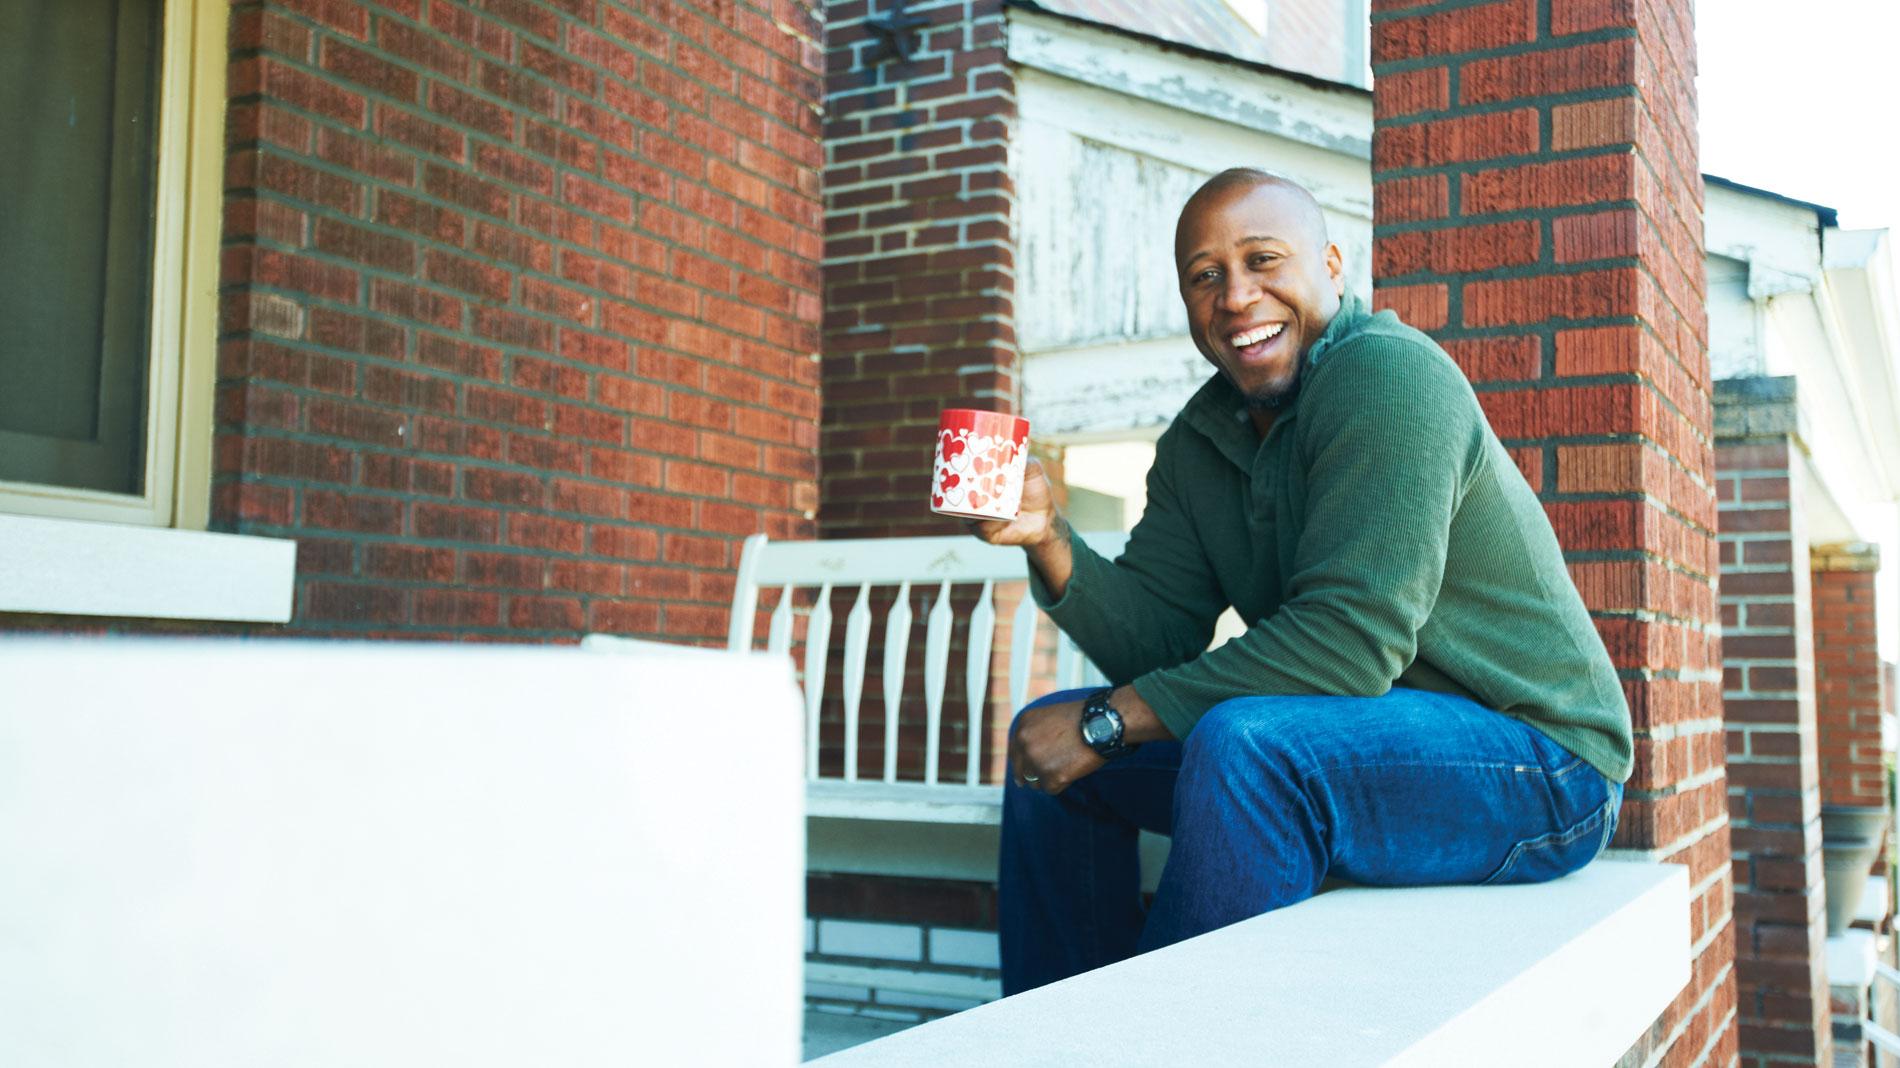 a man holding a mug and sitting on a brick ledge